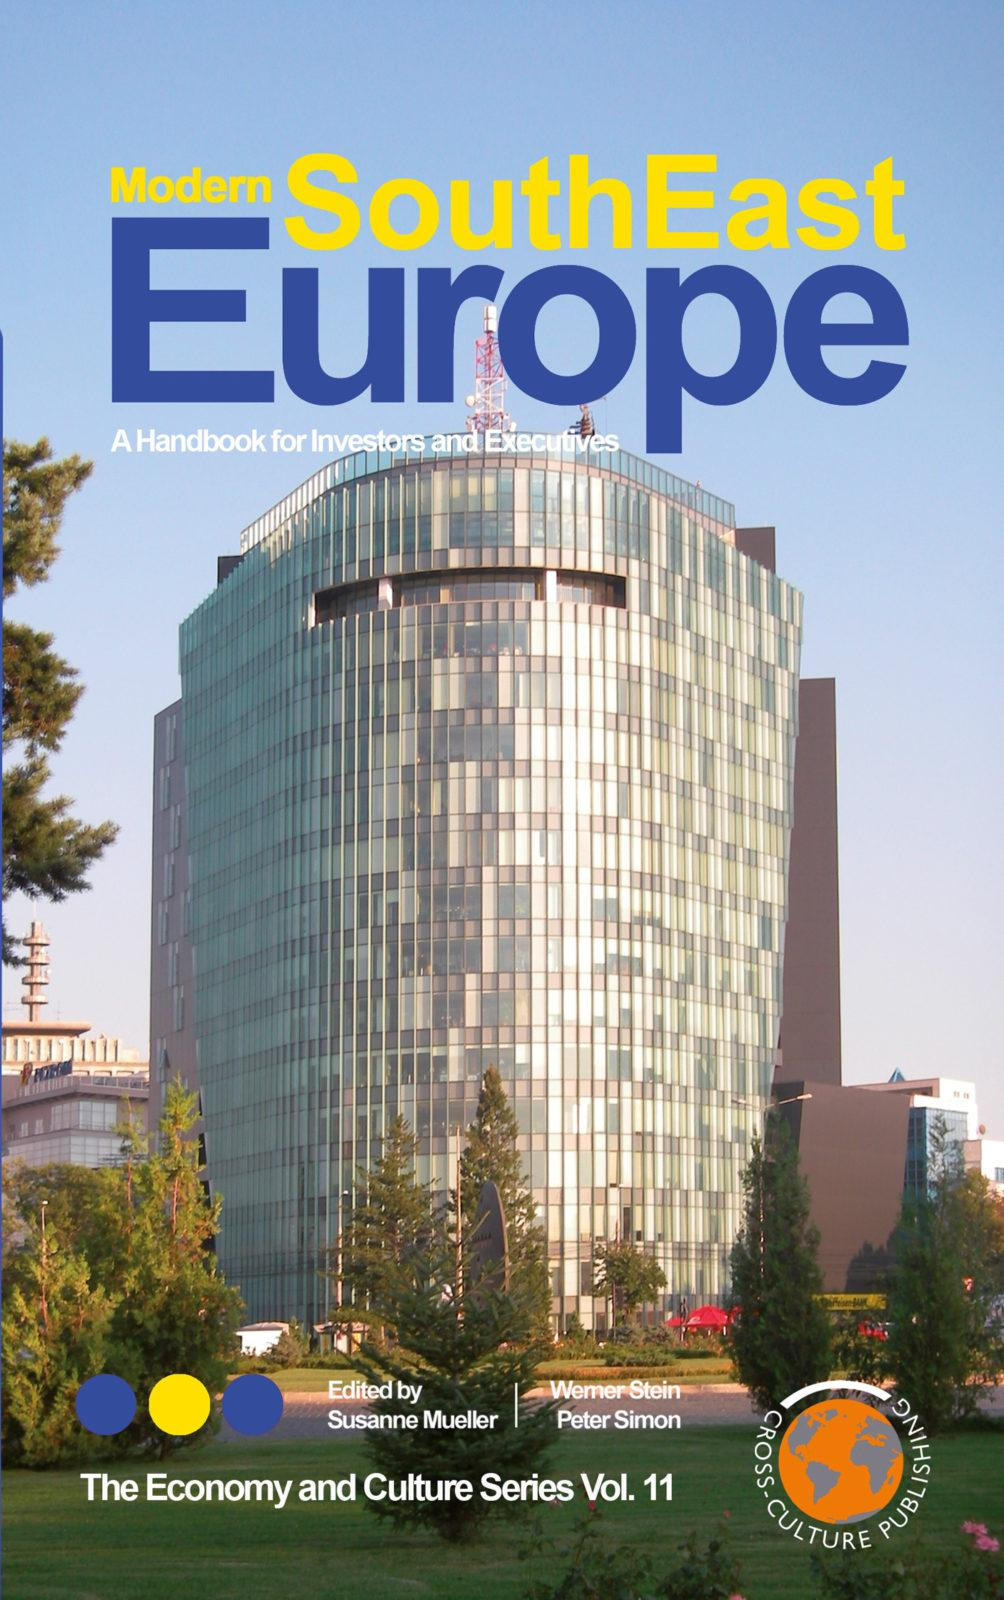 Modern South East Europe